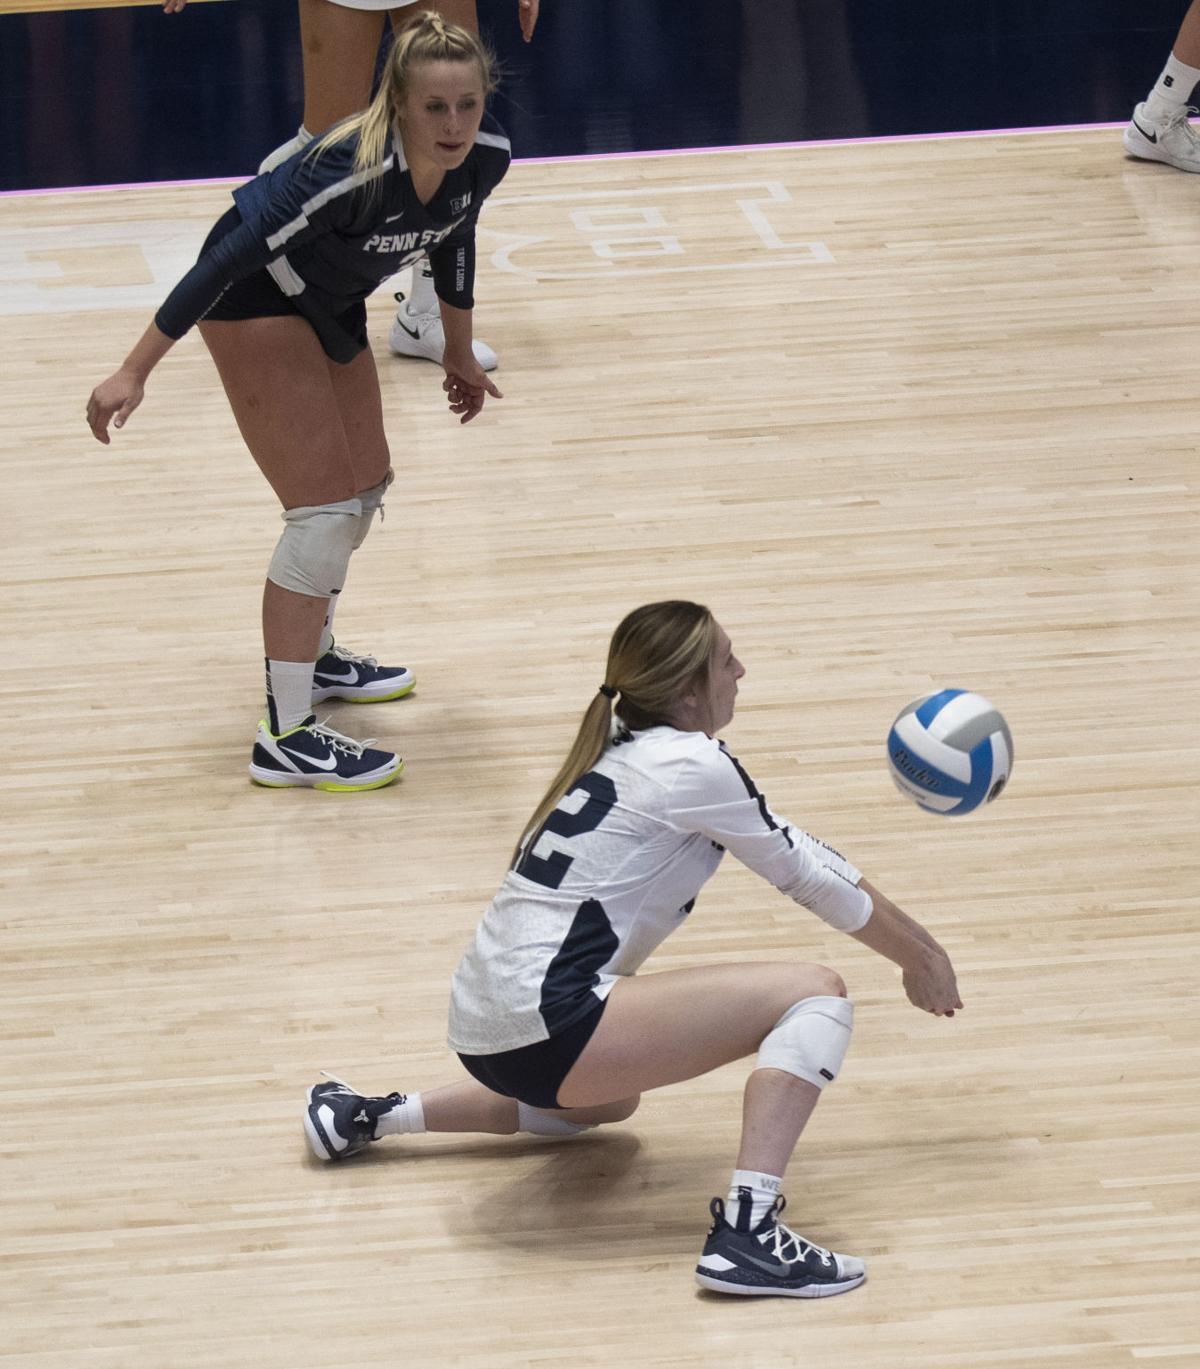 Women's Volleyball vs. Iowa, Holcomb (12)